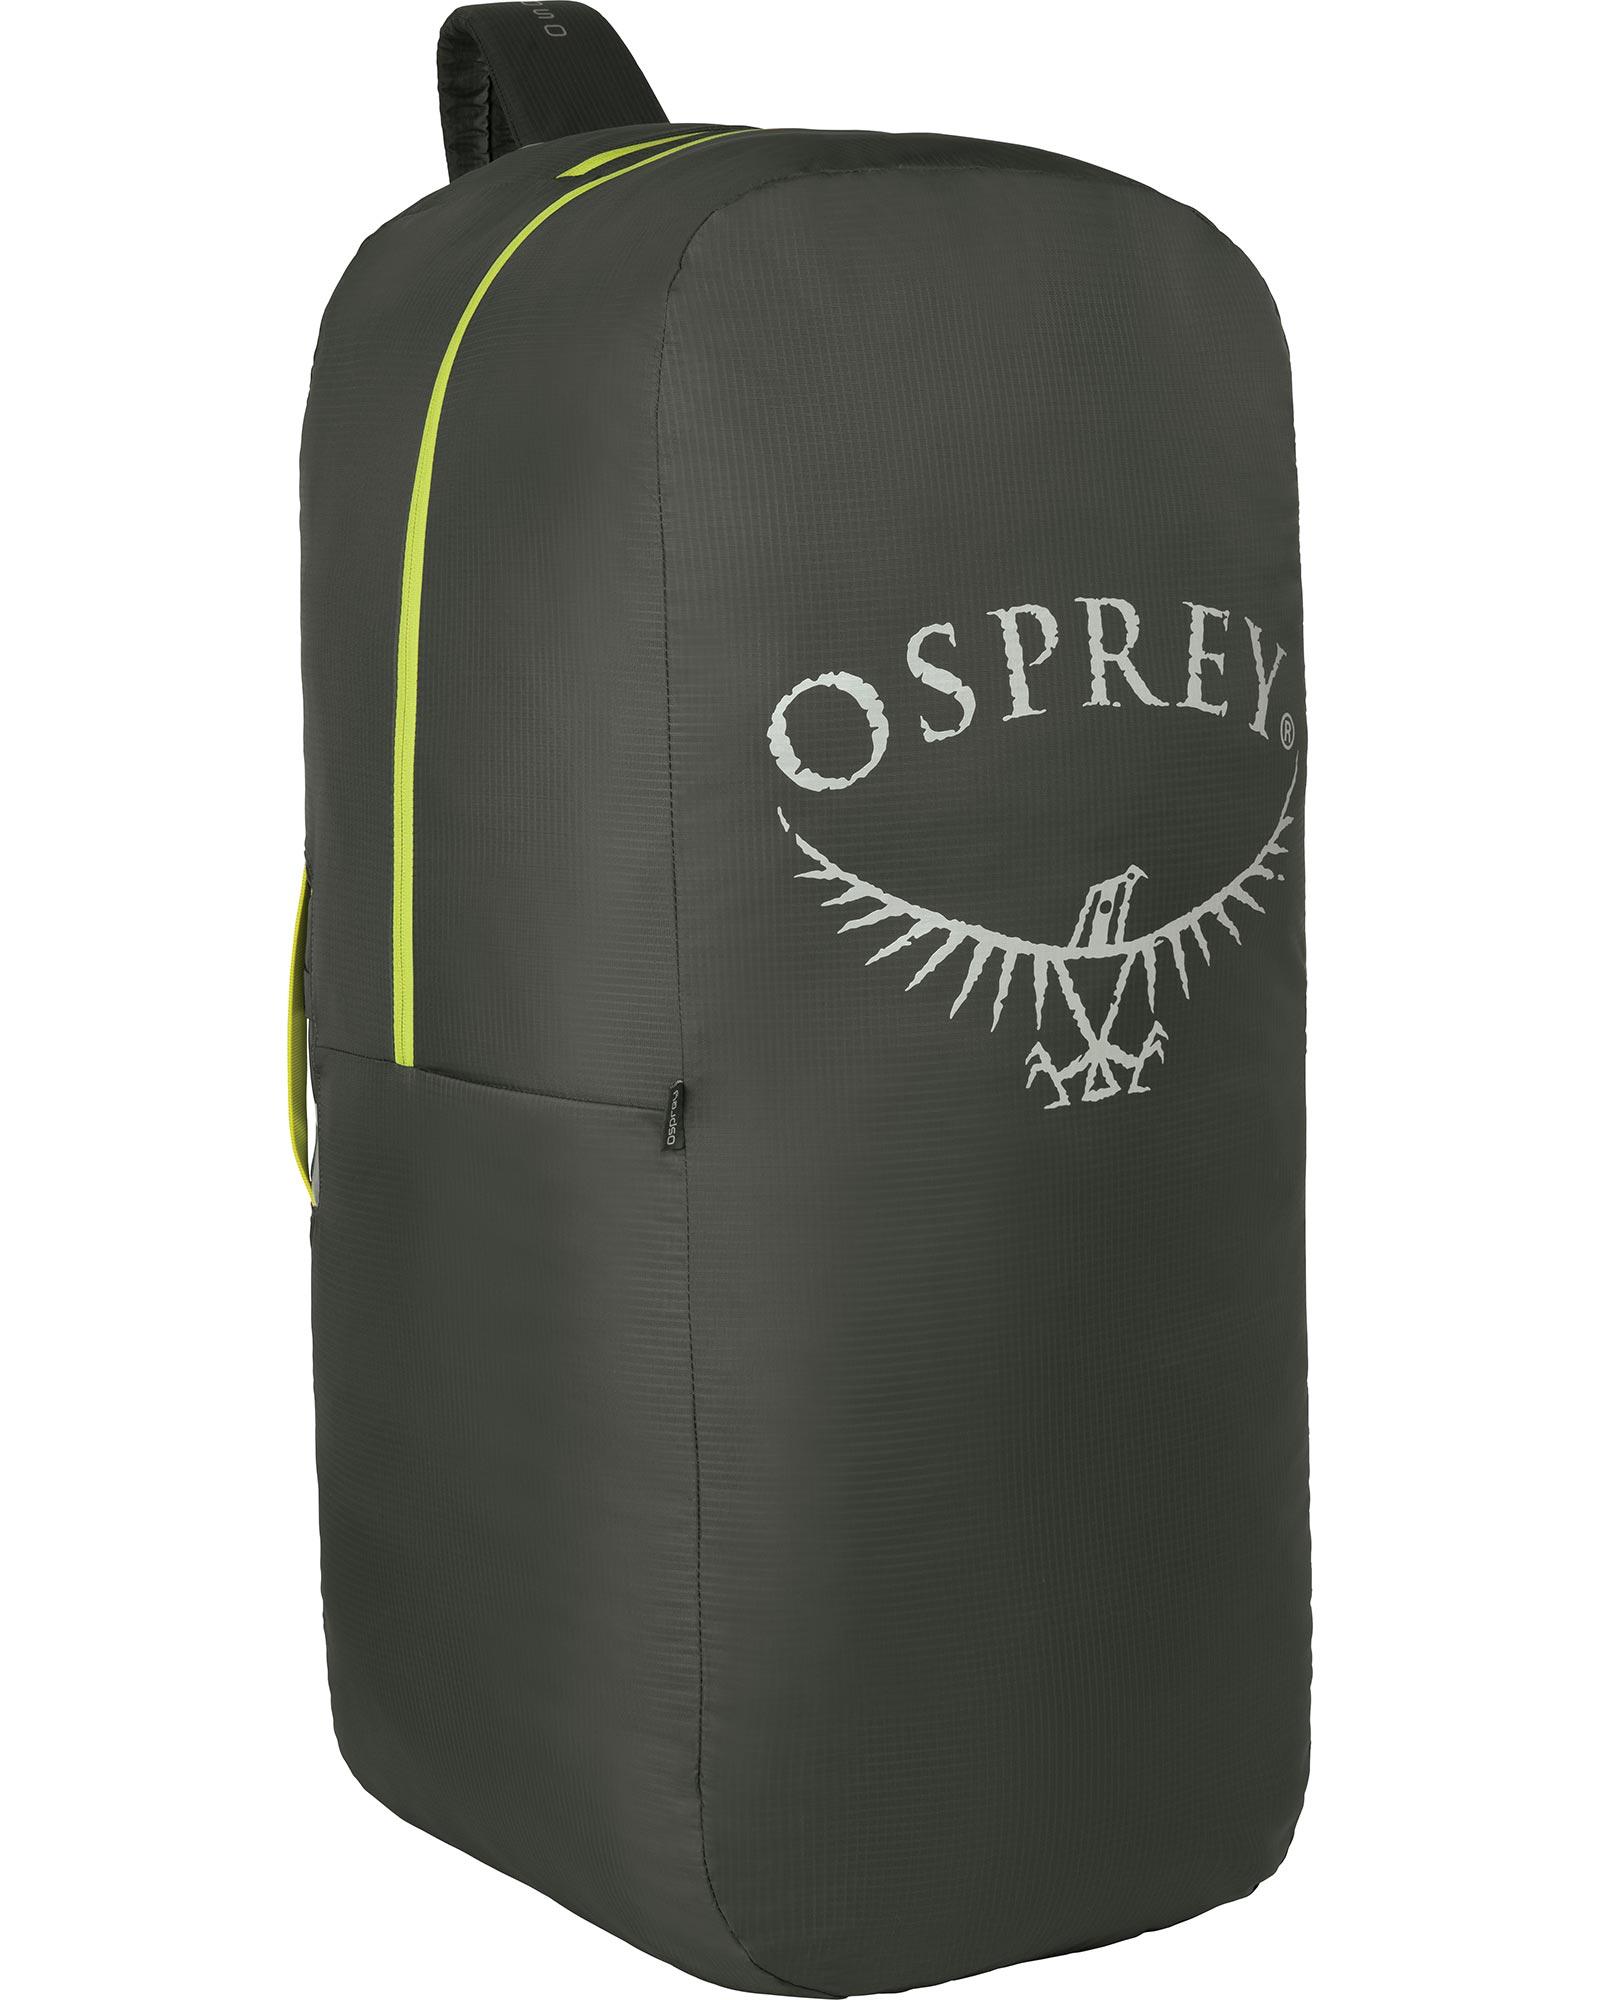 Osprey Airporter MED 0